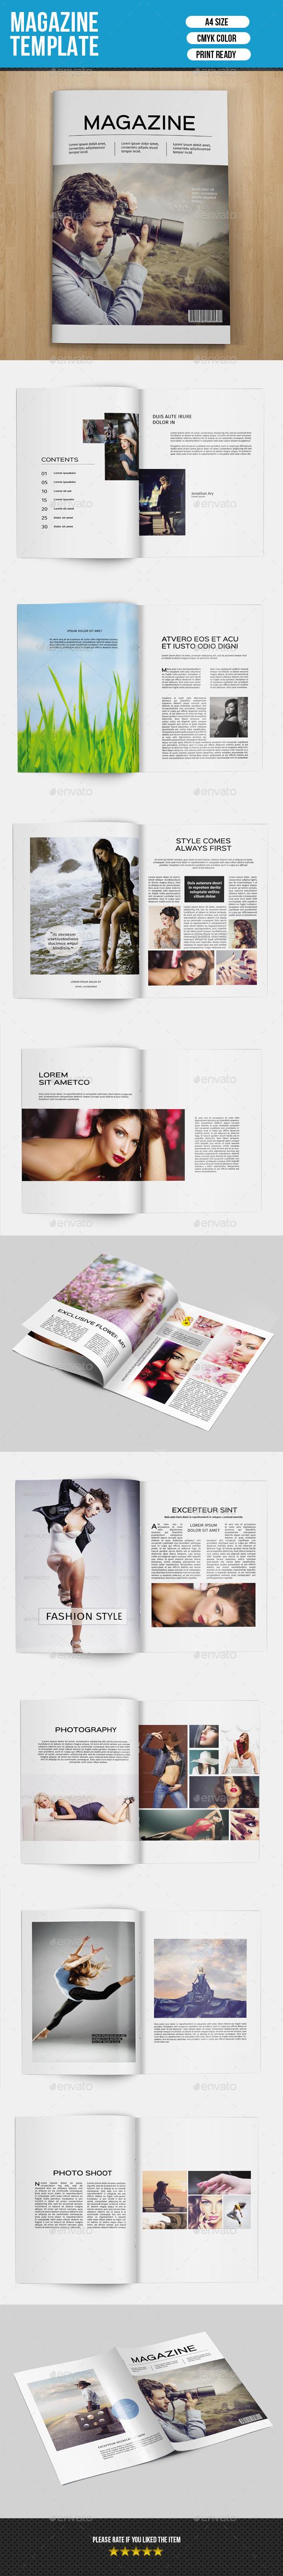 Minimal Magazine Template-V01 - Magazines Print Templates